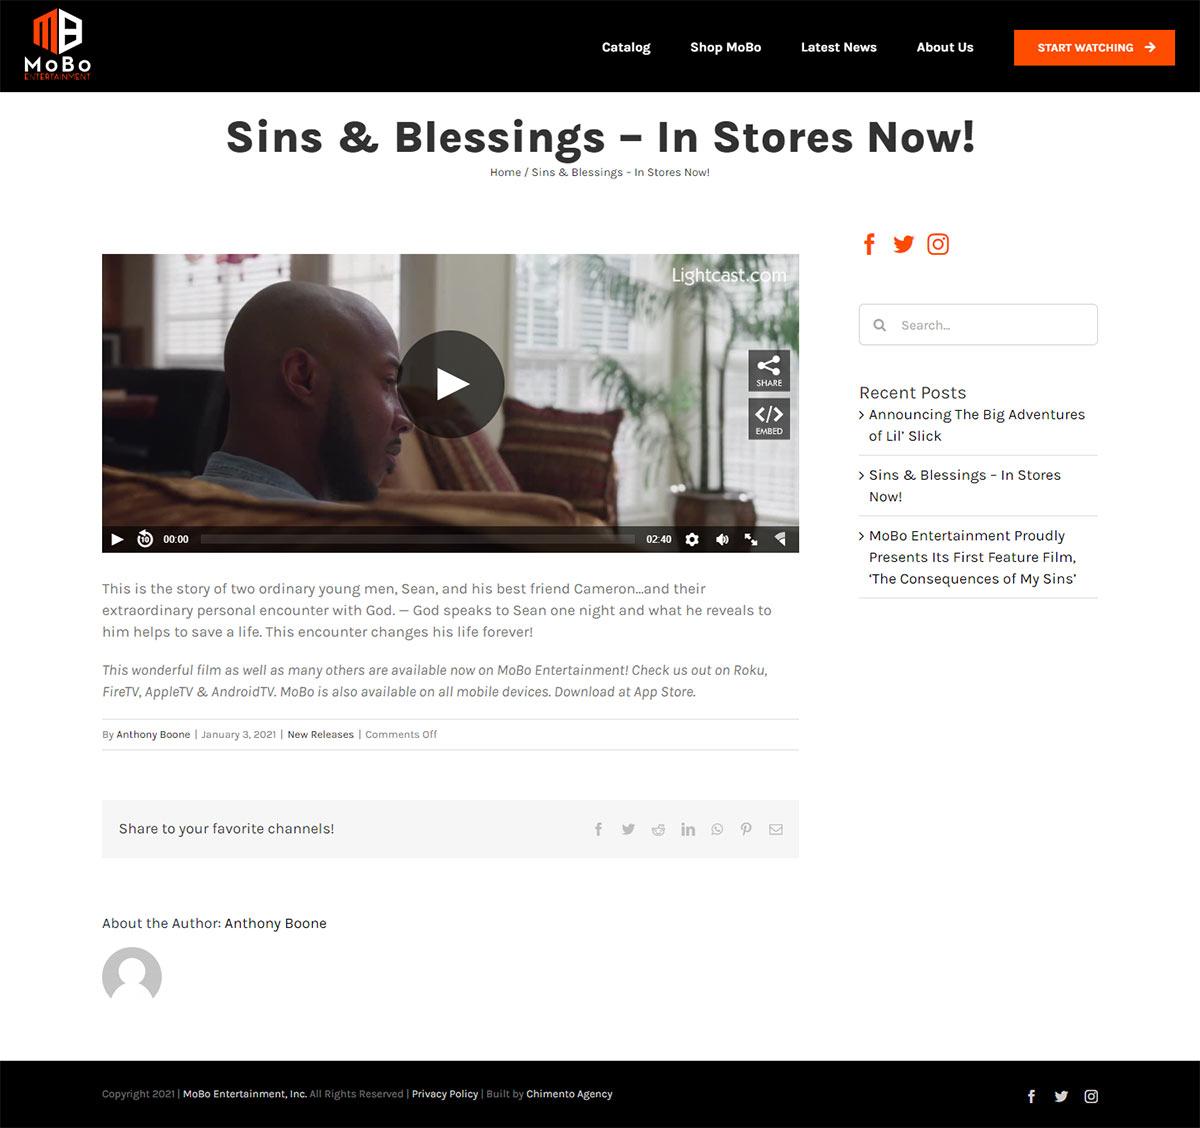 Blog post on MoBo website